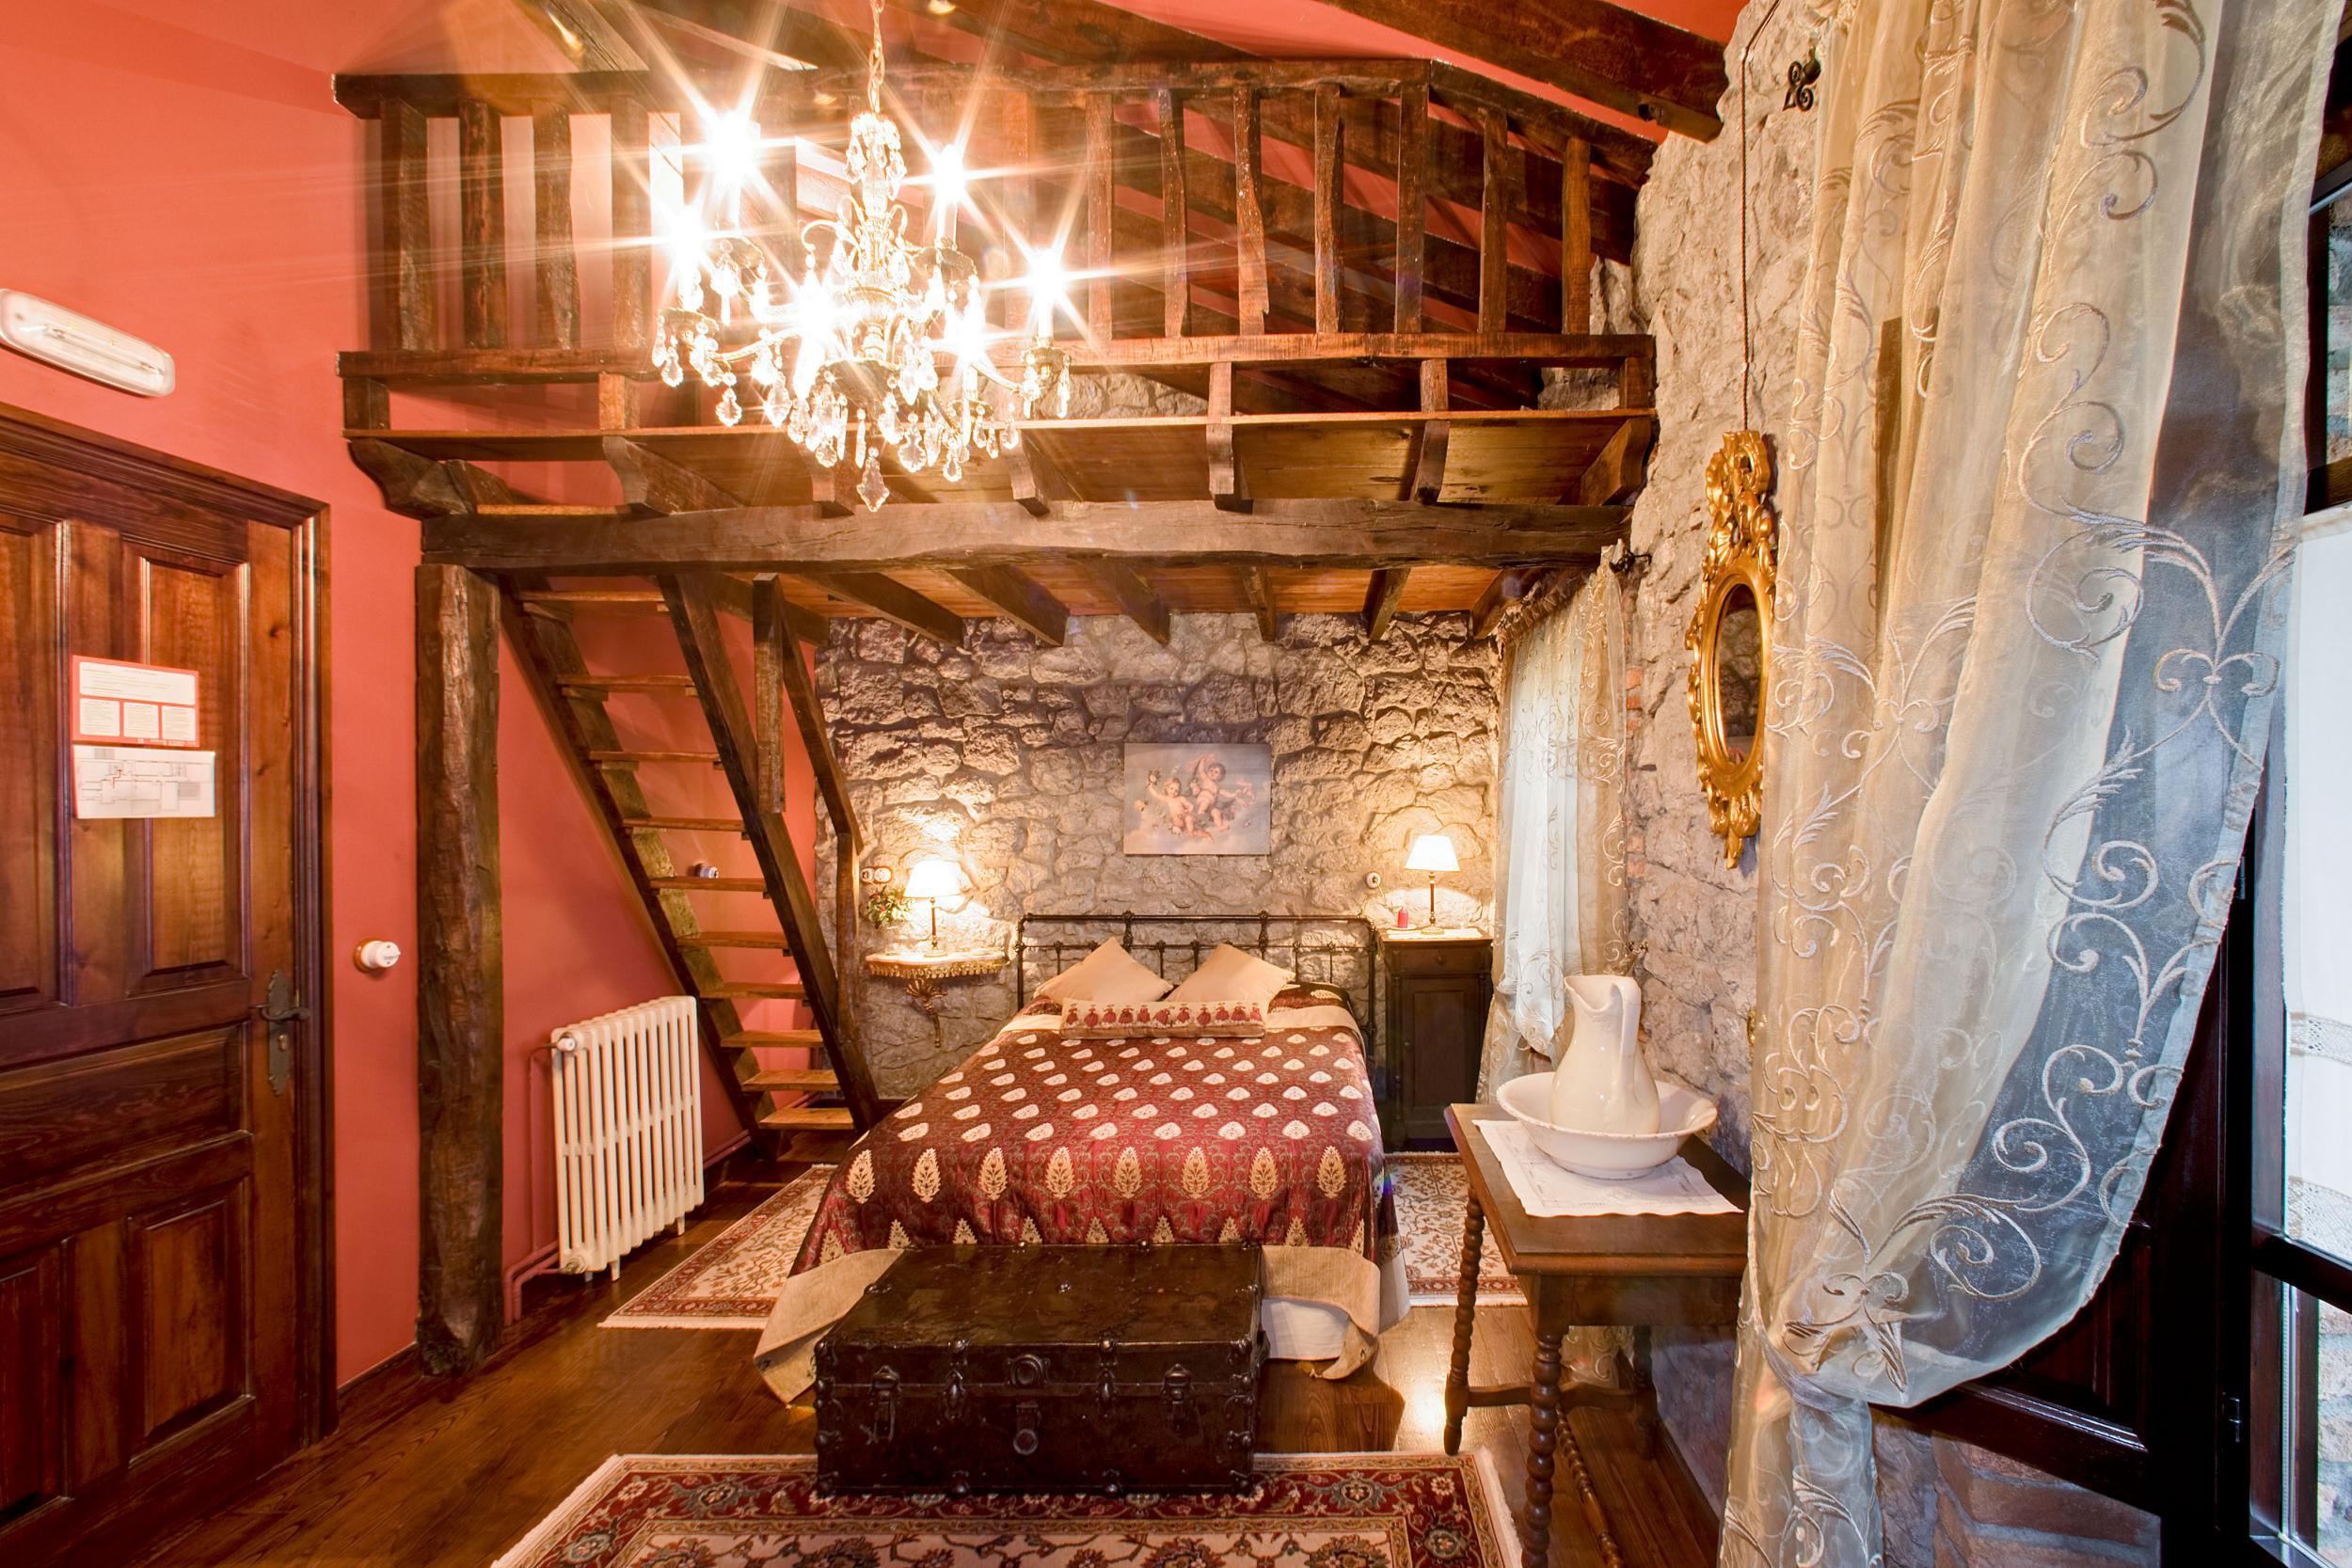 Casa rural posada de pedre a pedre a - Lavabos de piedra rusticos ...